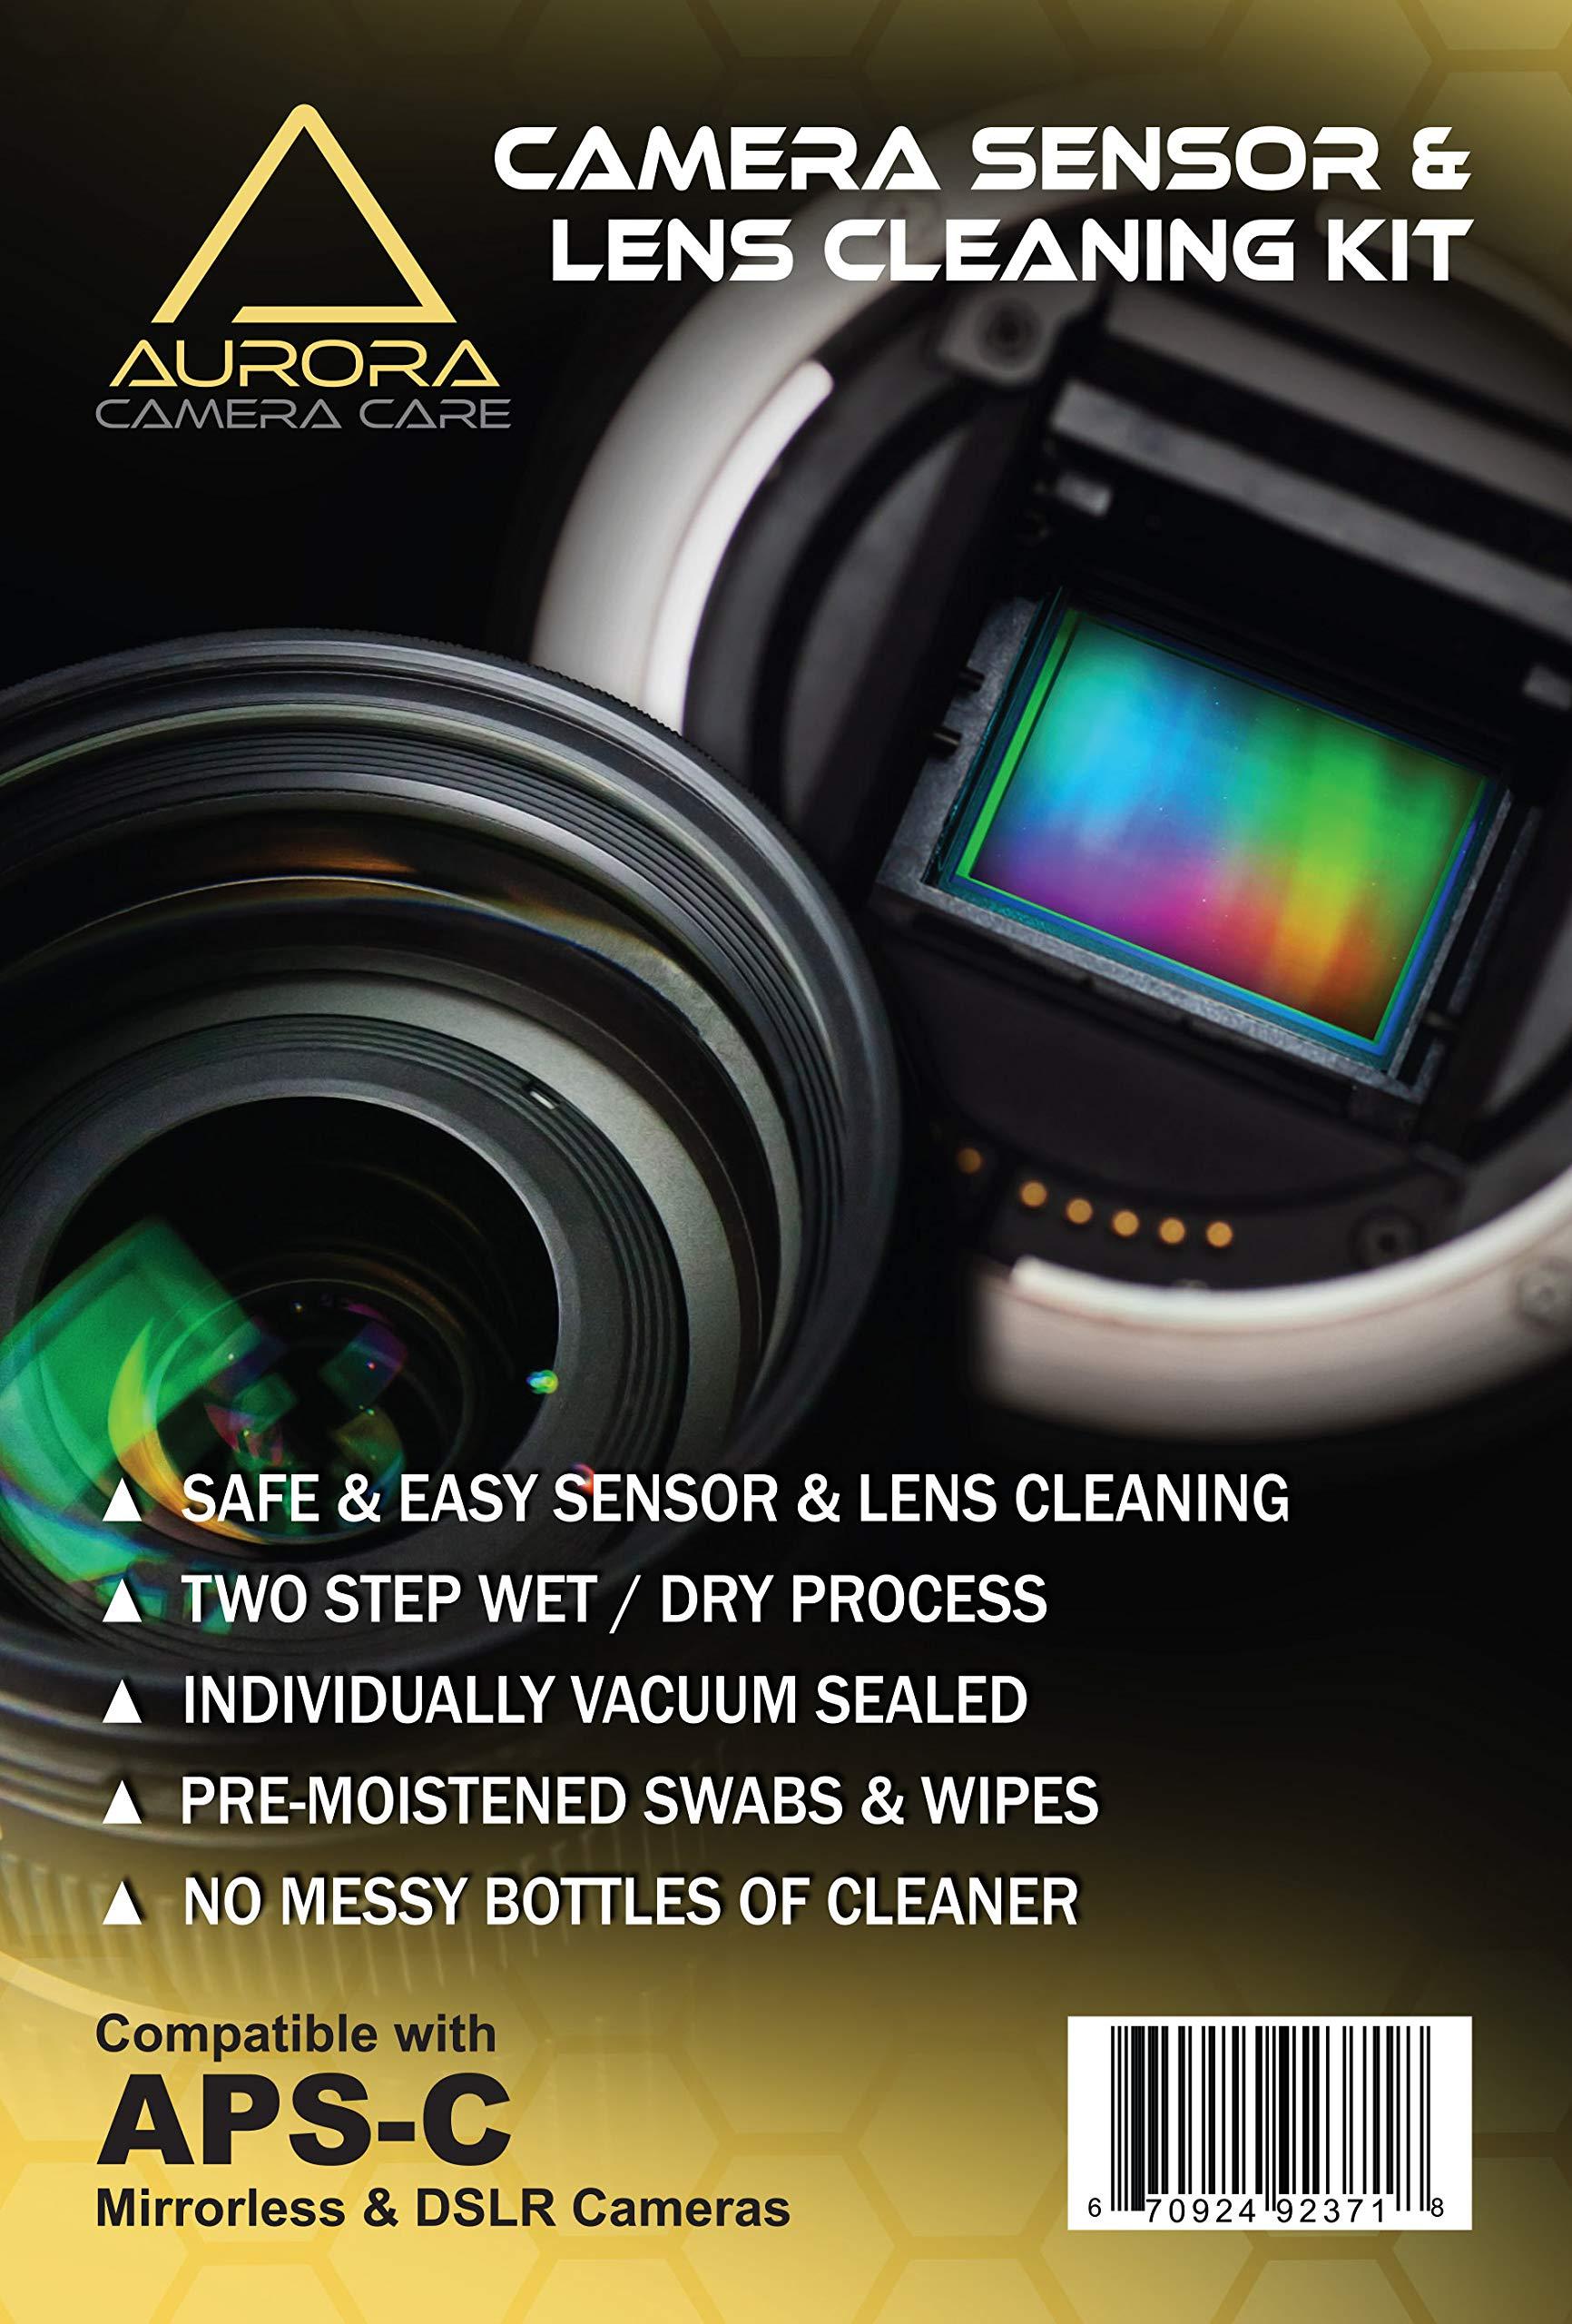 Aurora Camera Care Camera Sensor & Lens Cleaning Kit (APS-C)